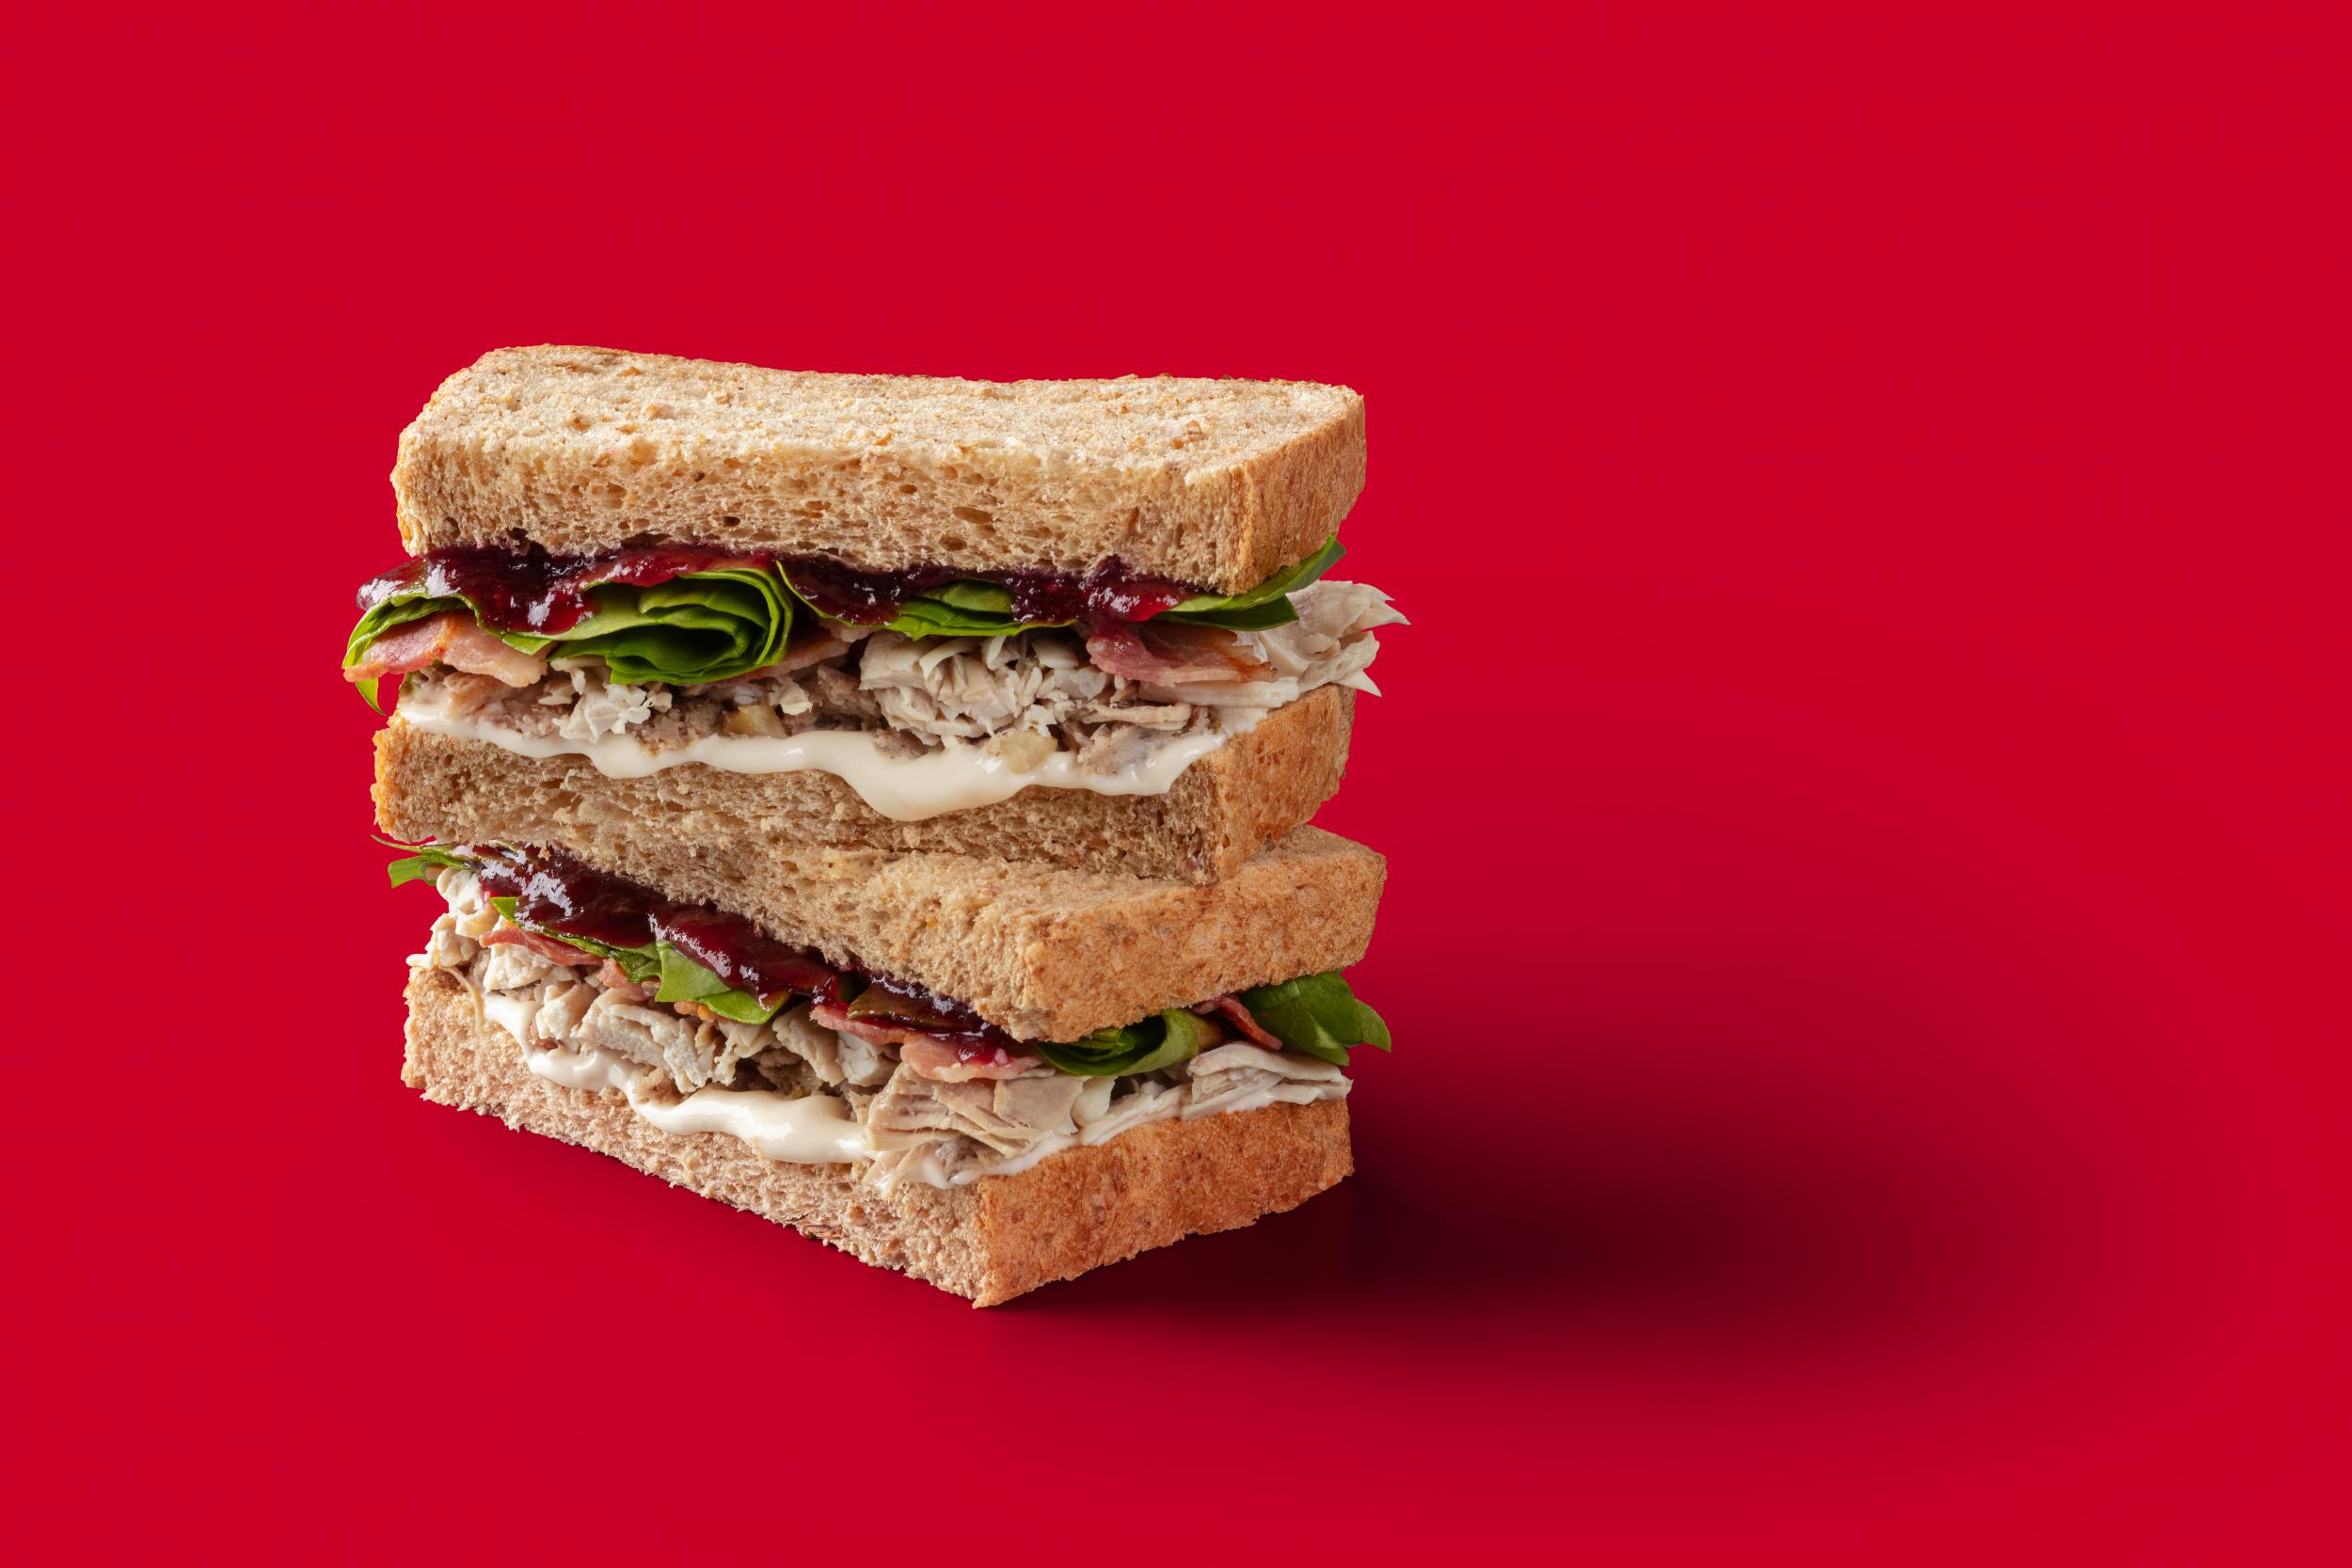 Christmas Sandwiches Compared Pret A Manger Vs Starbucks